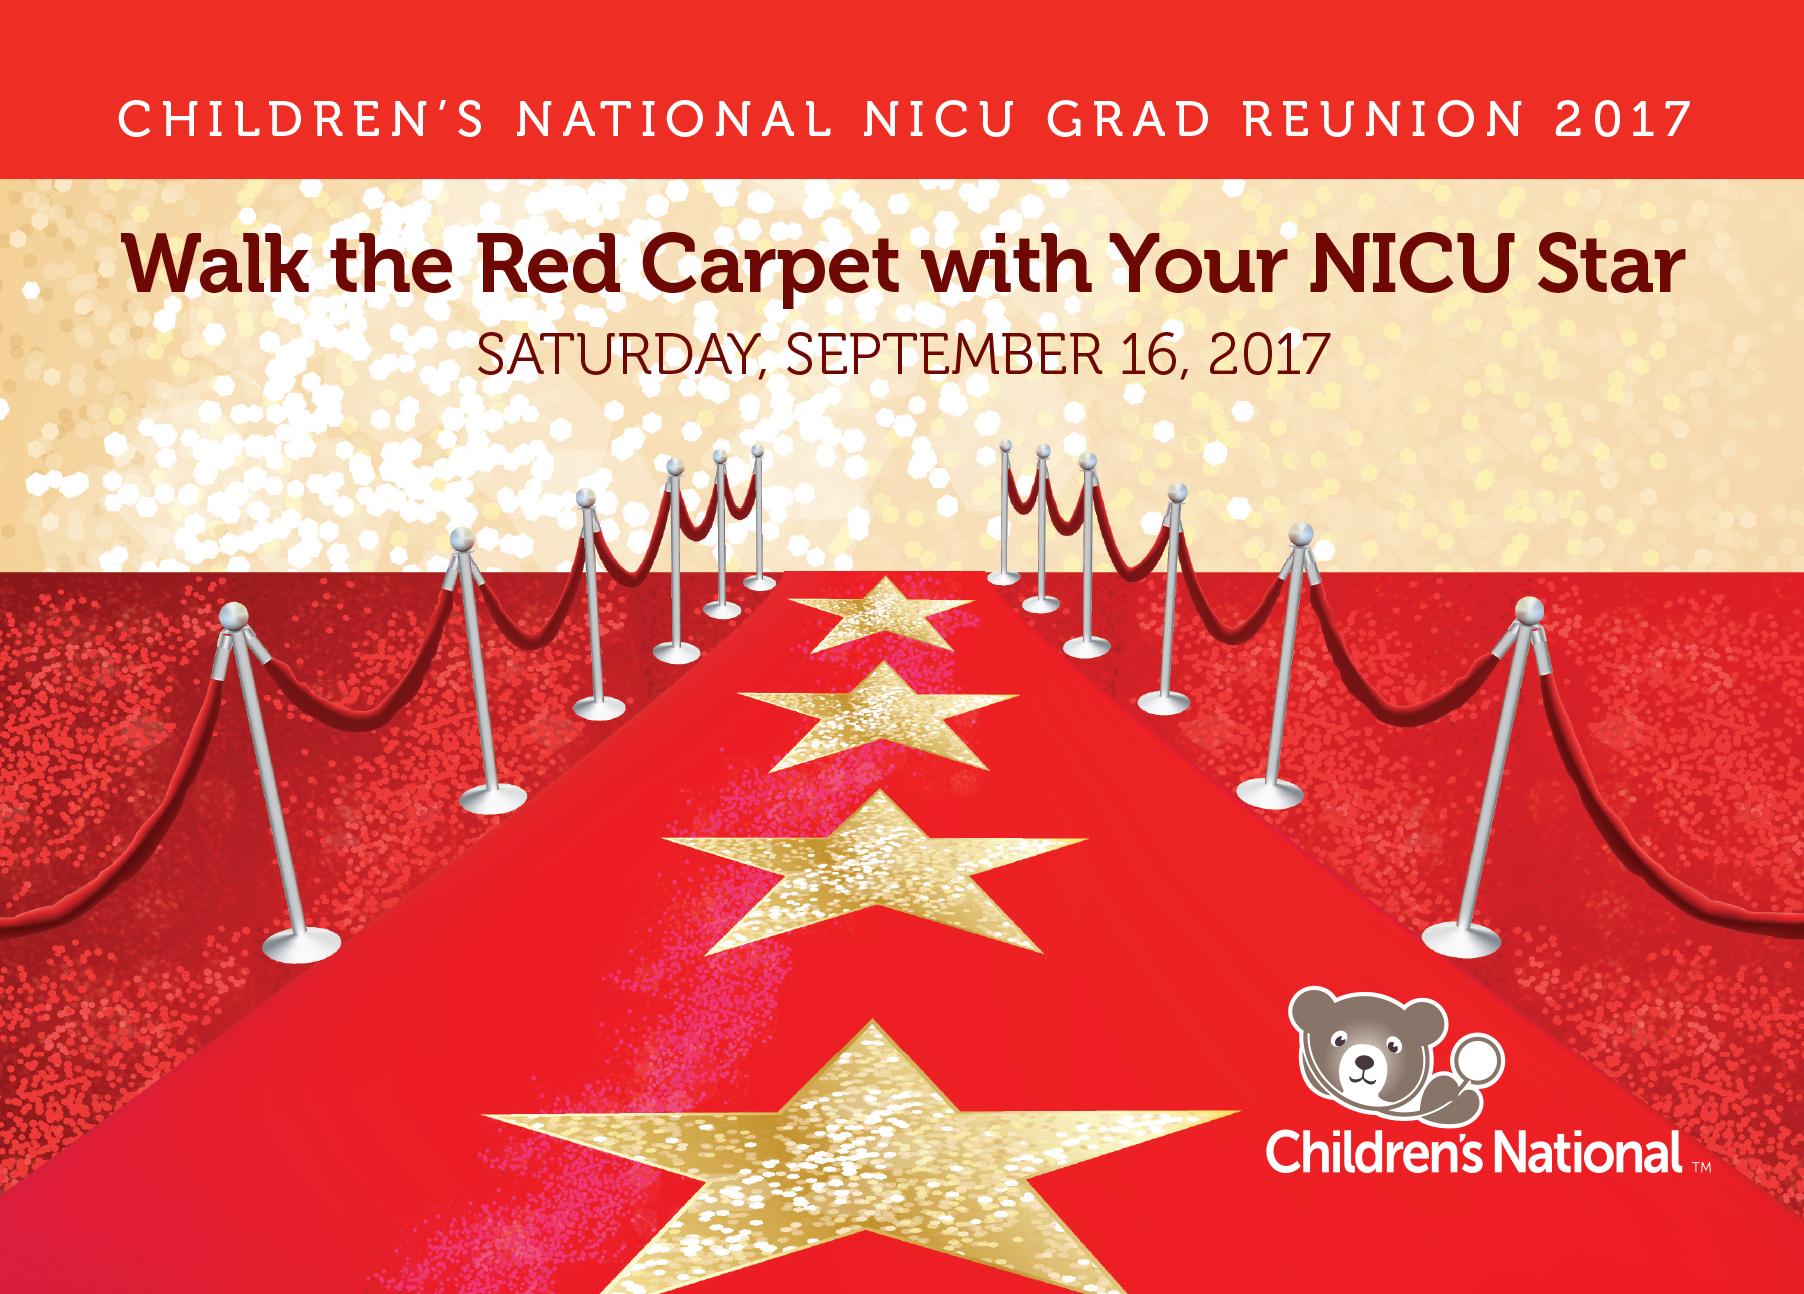 Children's National NICU Grad Reunion 2017